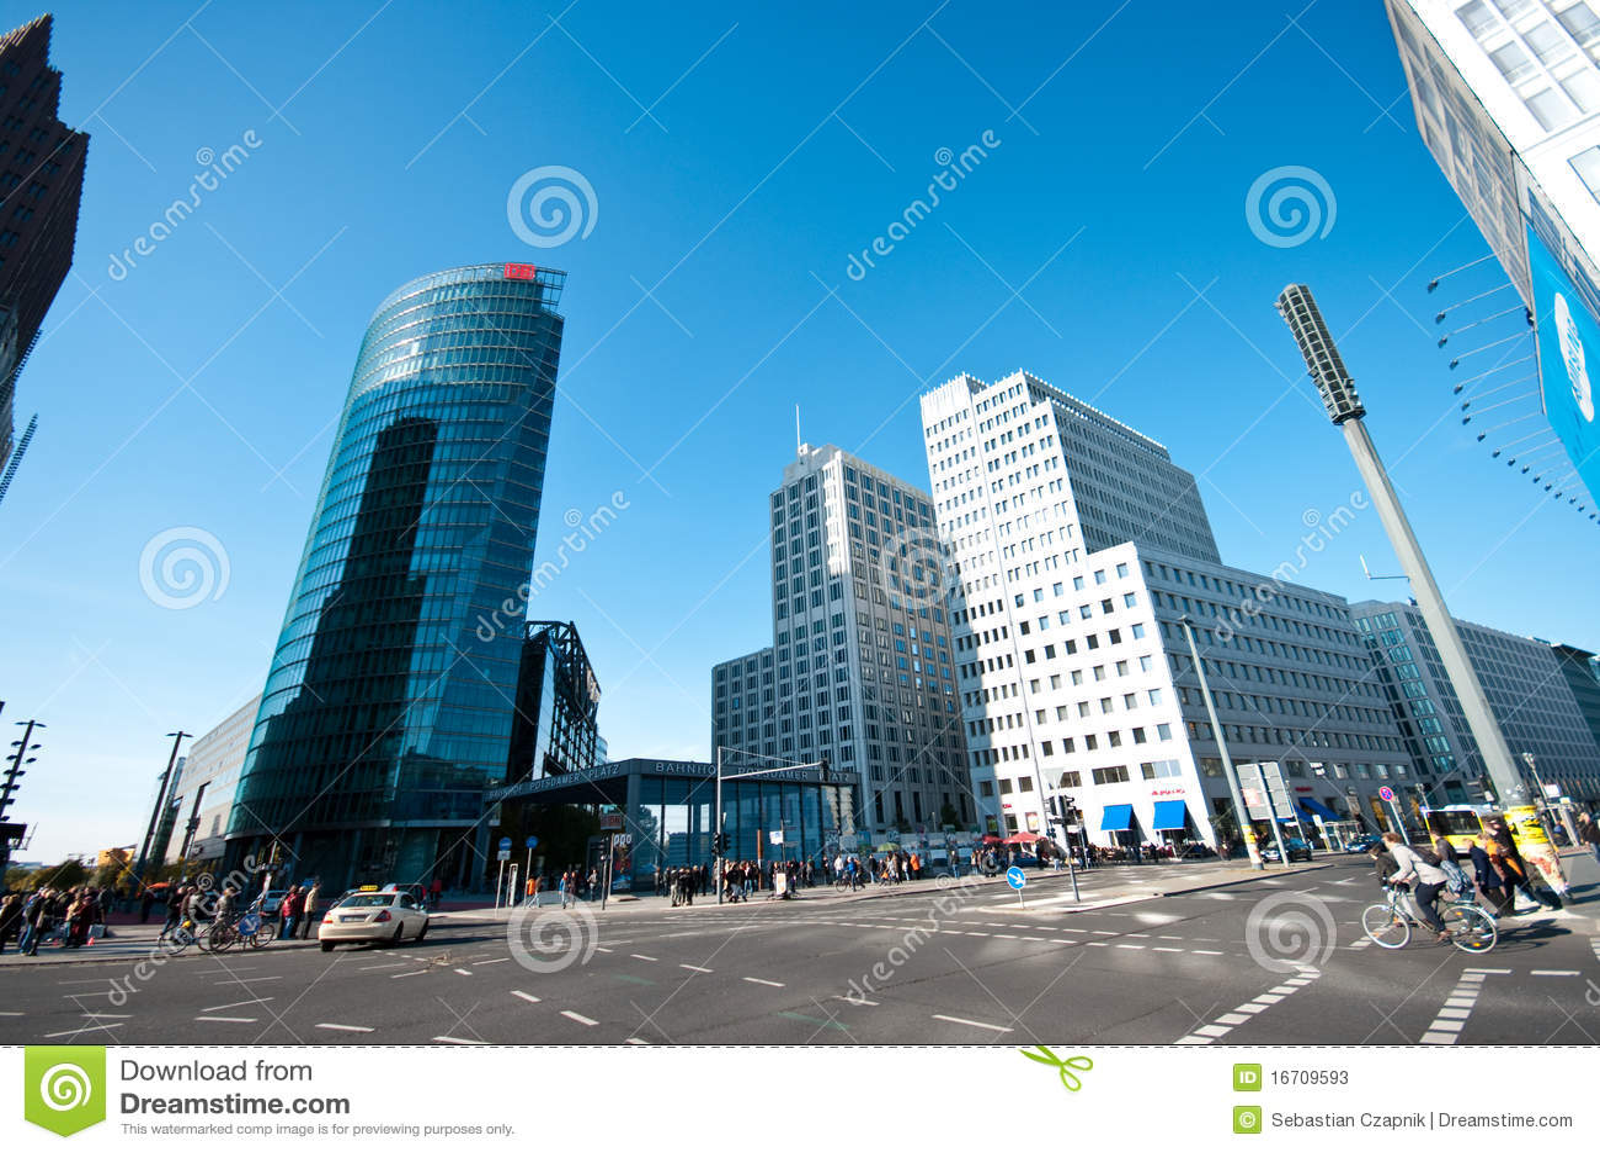 Download Berlin, Potsdamer Platz editorial stock photo. Image of sony - 16709593